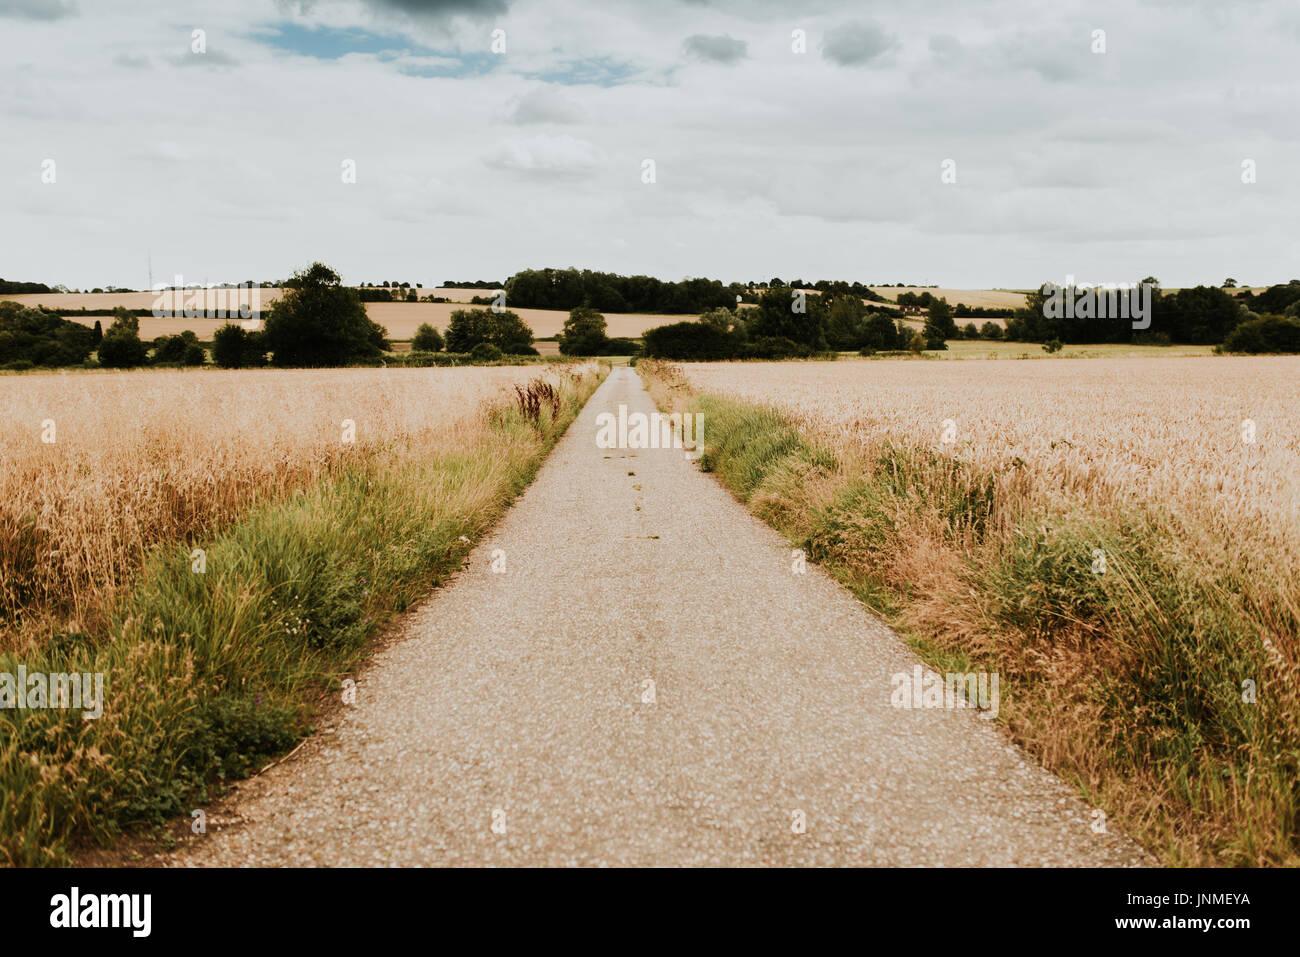 Landsape in England, Suffolk region - Stock Image